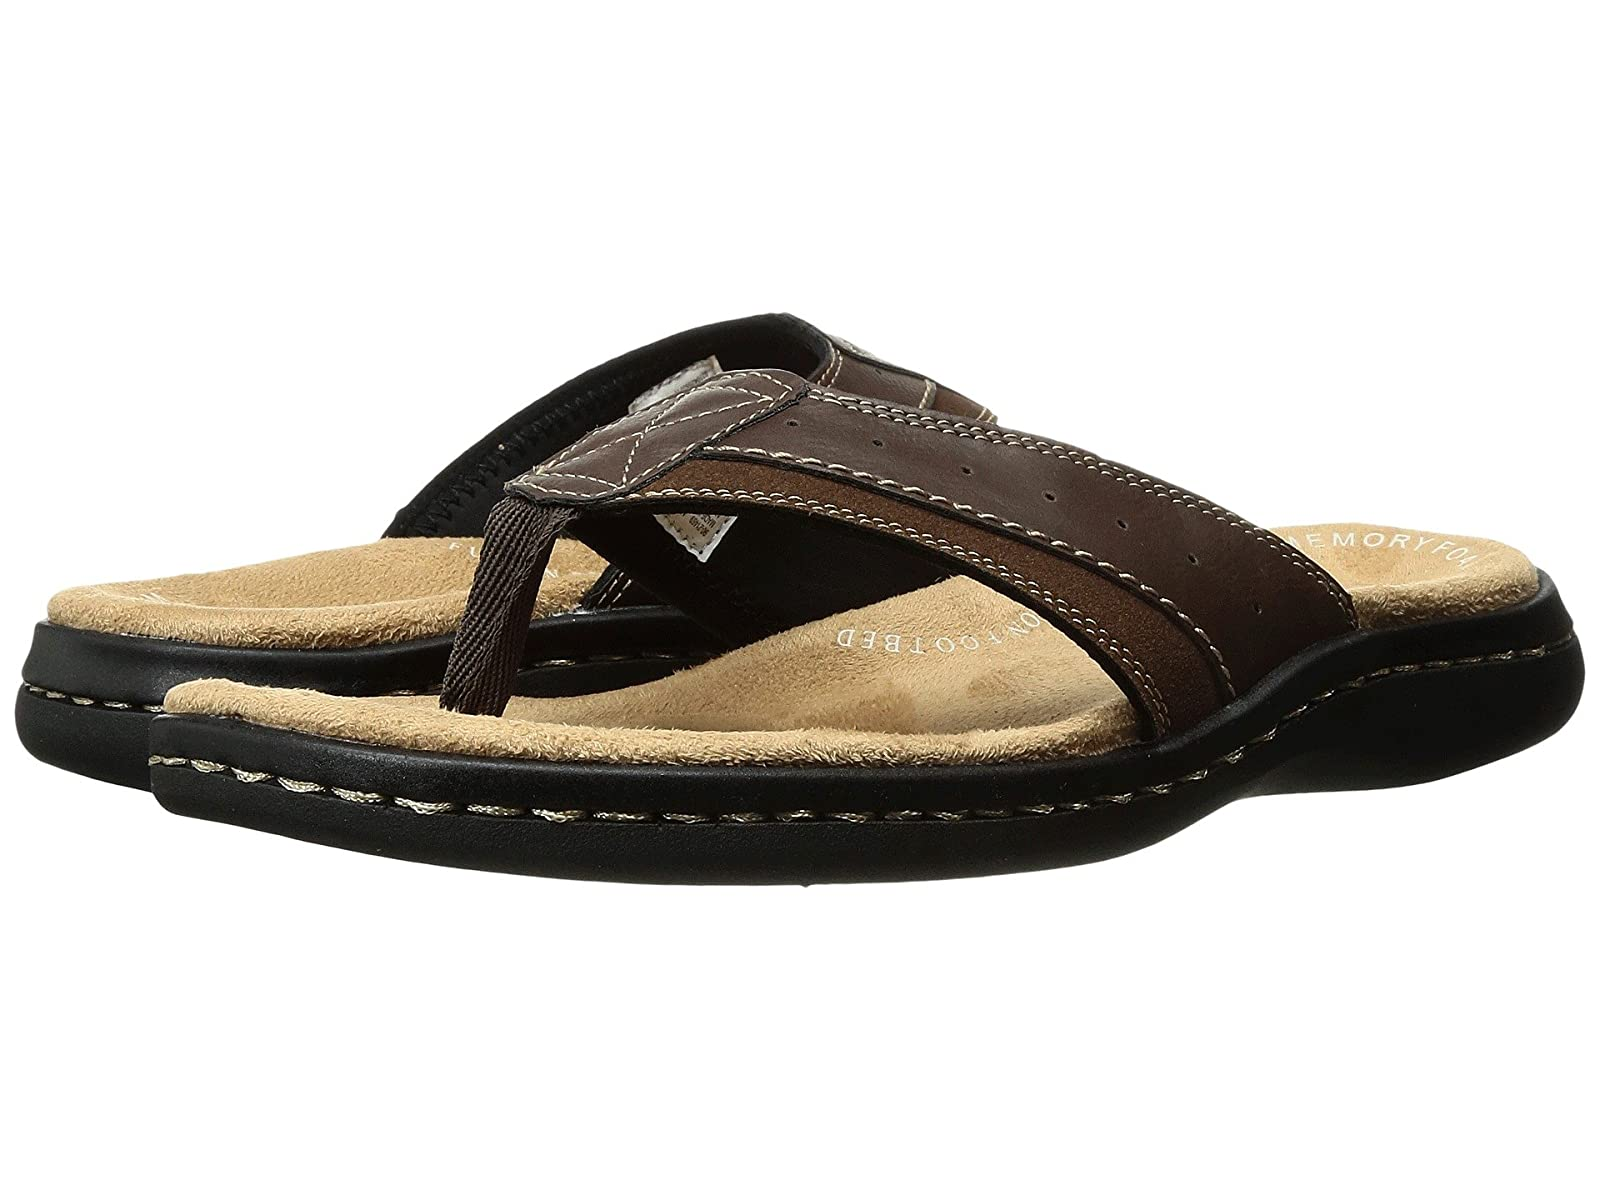 Dockers Laguna Thong SandalComfortable and distinctive shoes